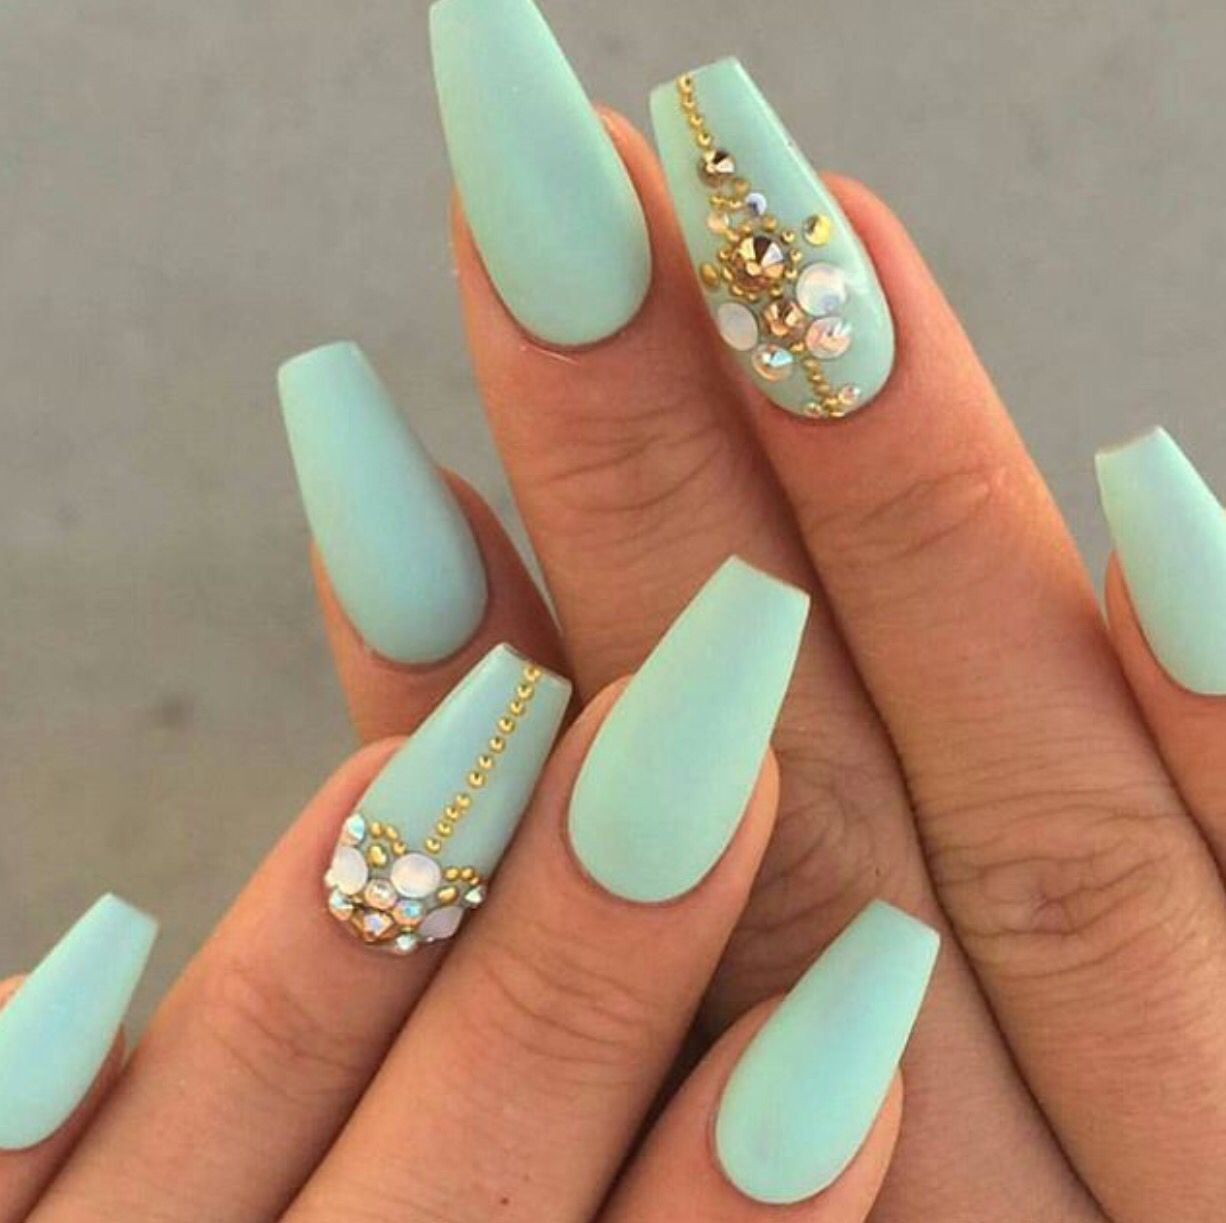 Pinterest: @JordanChrome   Nails&Toes   Pinterest   Nail nail ...